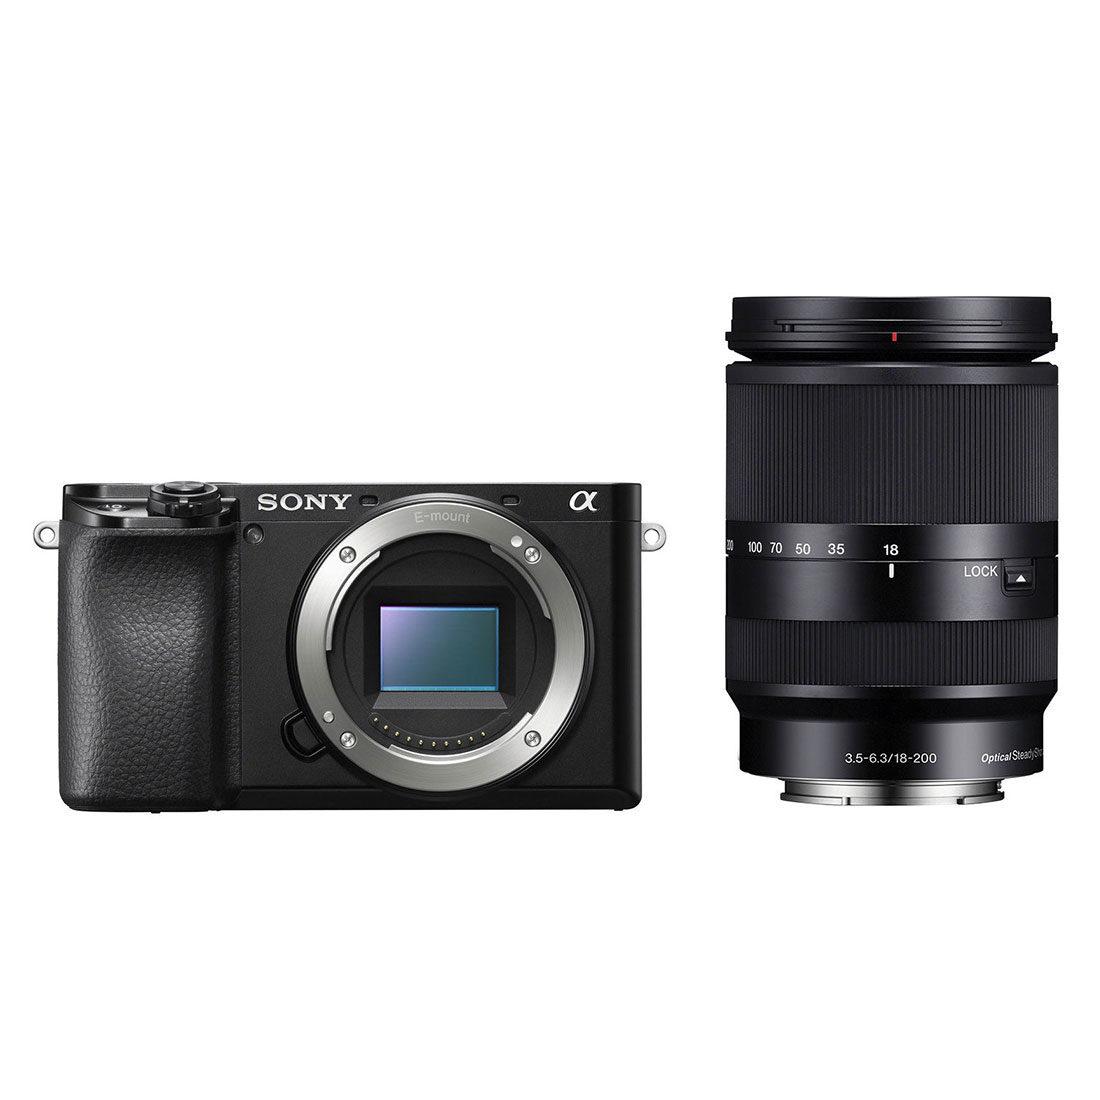 Sony Alpha A6100 systeemcamera Zwart + 18-200mm f/3.5-6.3 <br/>€ 1299.00 <br/> <a href='https://www.cameranu.nl/fotografie/?tt=12190_474631_241358_&r=https%3A%2F%2Fwww.cameranu.nl%2Fnl%2Fp3194857%2Fsony-alpha-a6100-systeemcamera-zwart-18-200mm-f-3-5-6-3%3Fchannable%3D002a59696400333139343835373c%26utm_campaign%3D%26utm_content%3DSony%2Bsysteemcamera%26utm_source%3DTradetracker%26utm_medium%3Dcpc%26utm_term%3DDigitale%2Bcamera%26apos%3Bs' target='_blank'>naar de winkel</a>